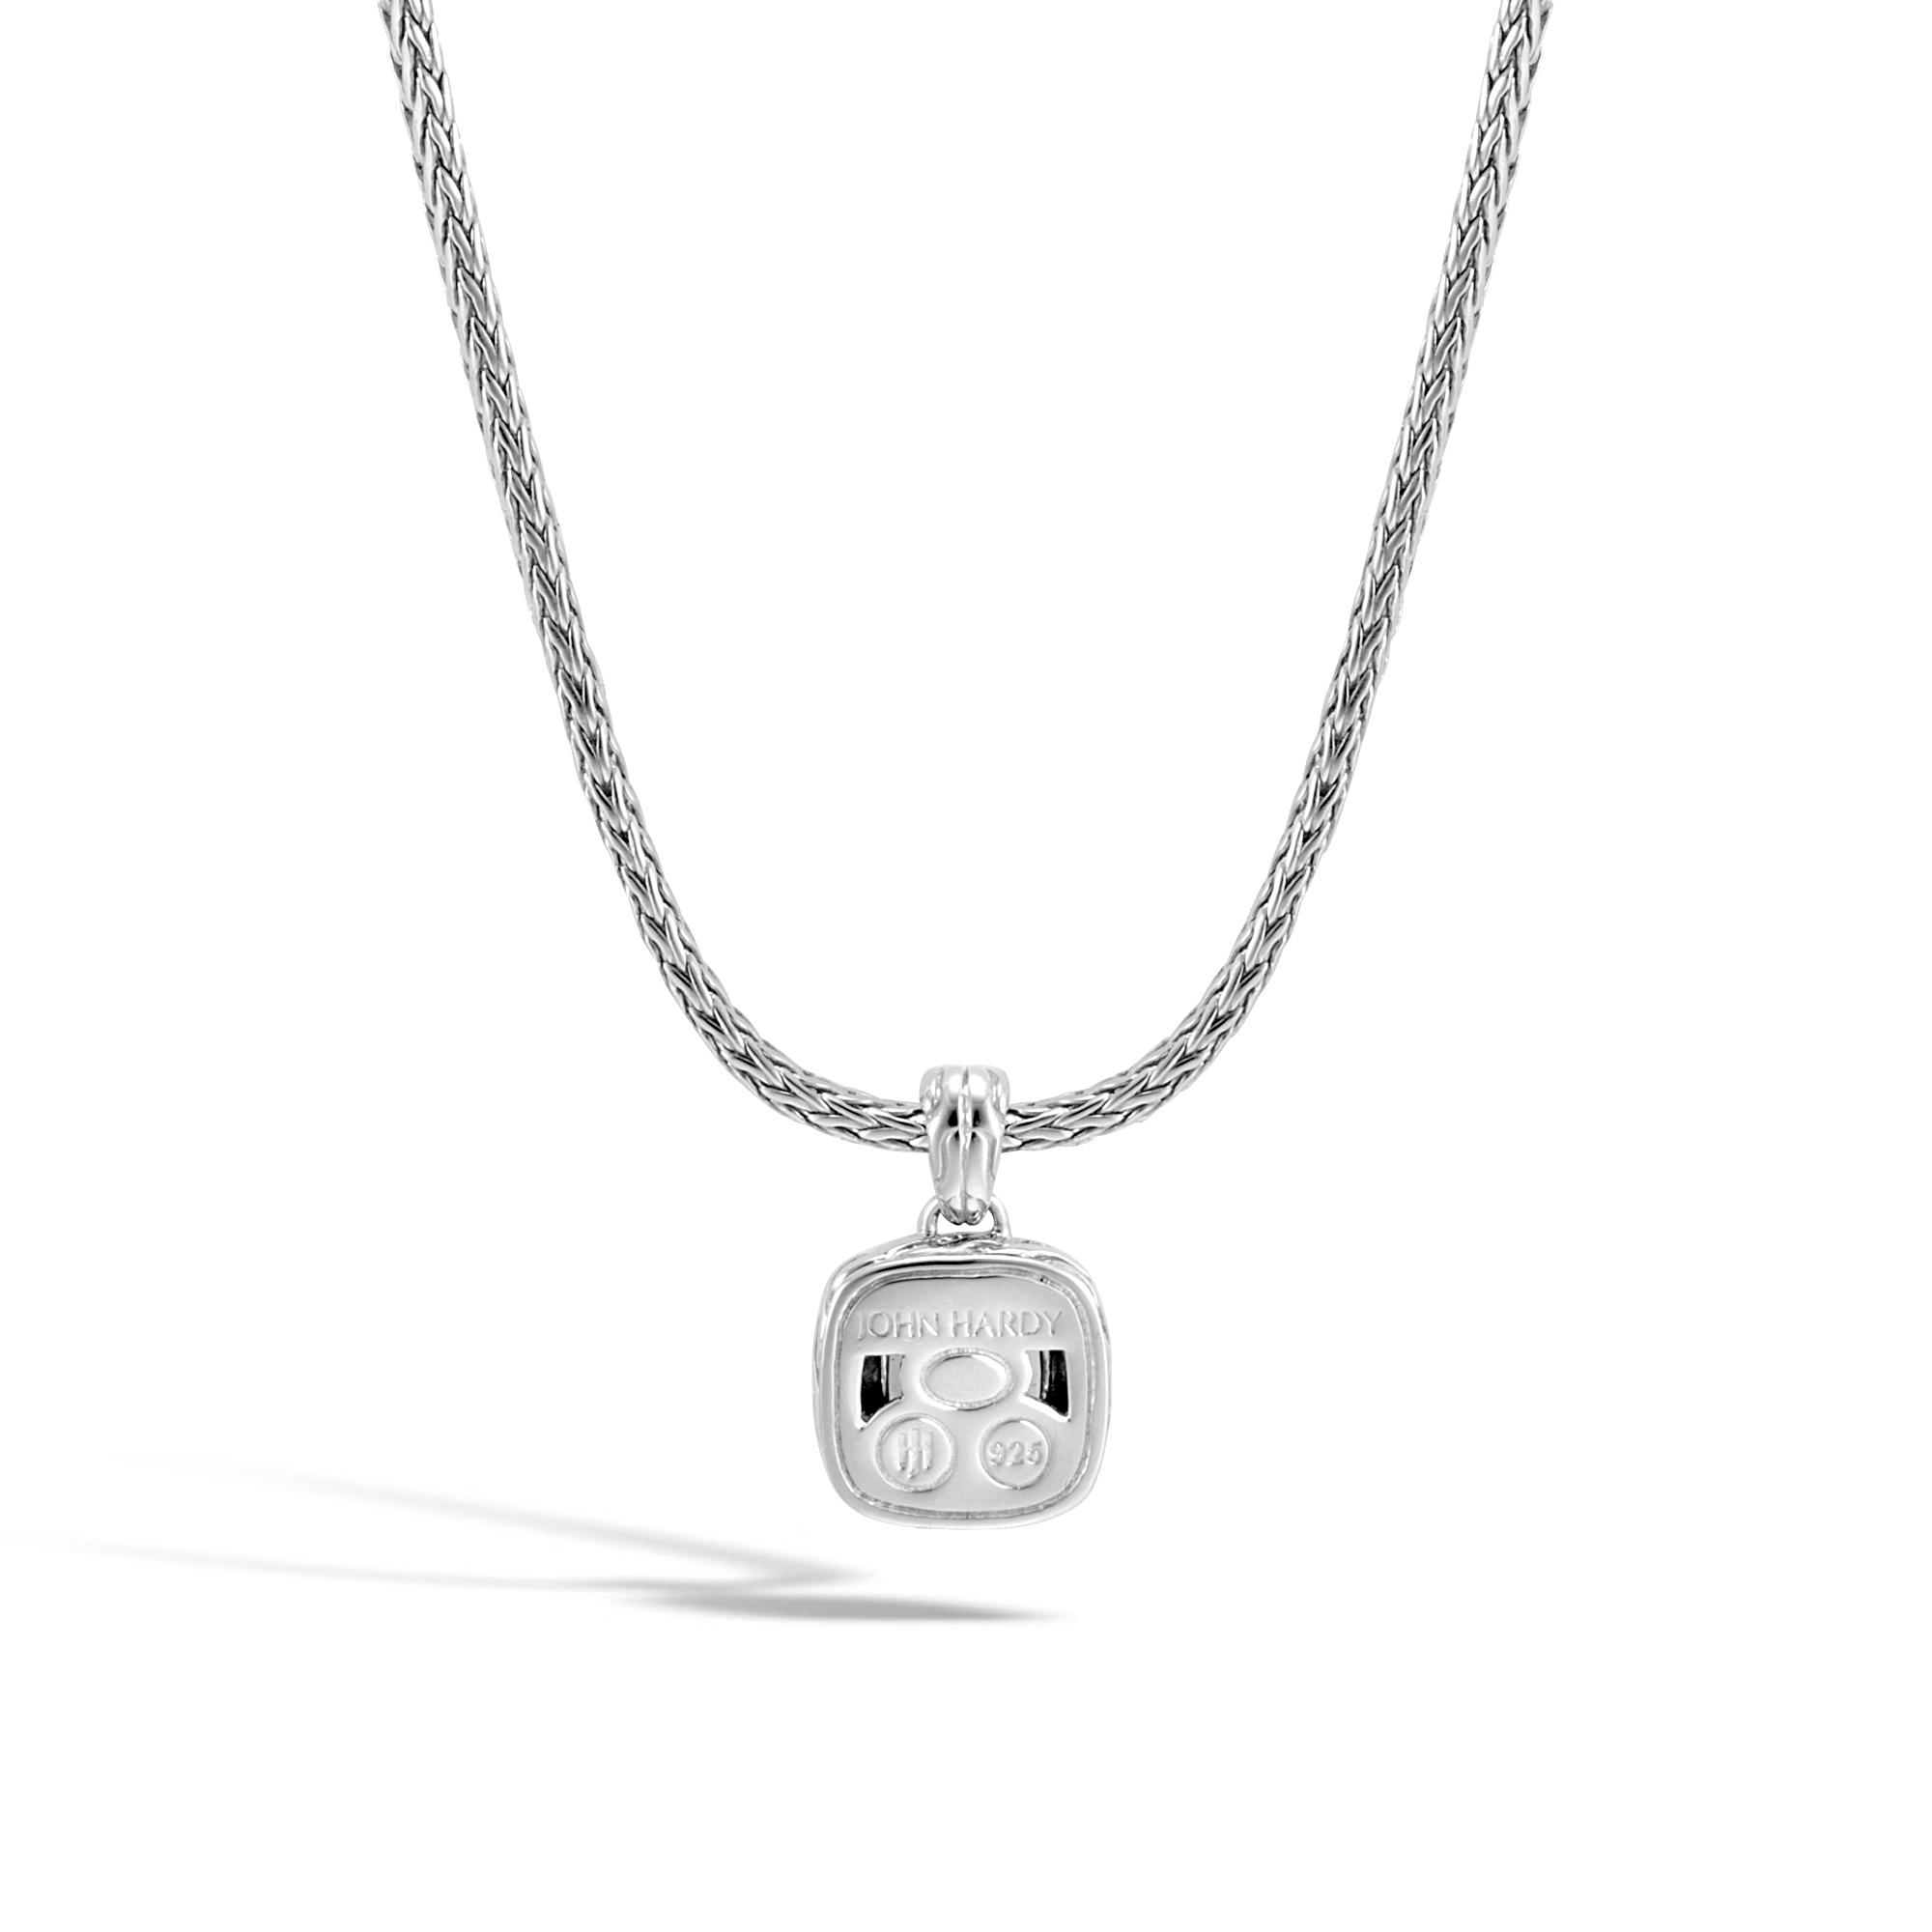 Classic Chain Magic Cut Pendant Necklace, Silver, 8MM Gem, Black Onyx, large